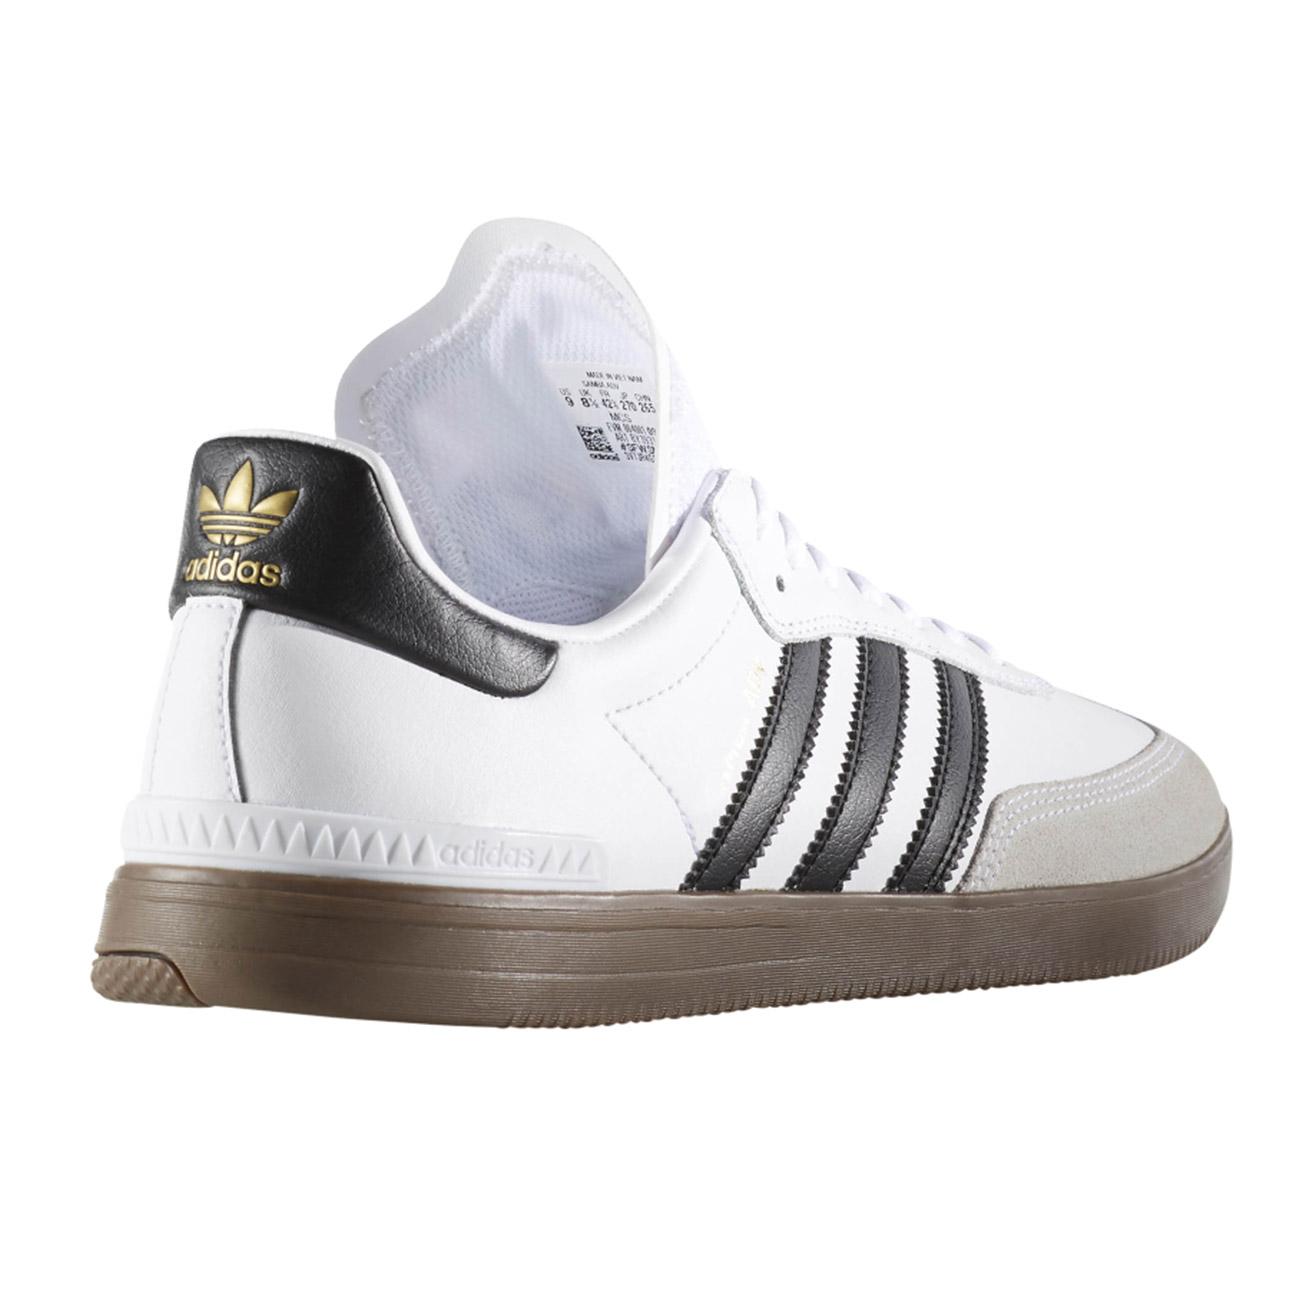 los angeles well known cheap prices Adidas Skateboarding Herren Sneaker SAMBA ADV